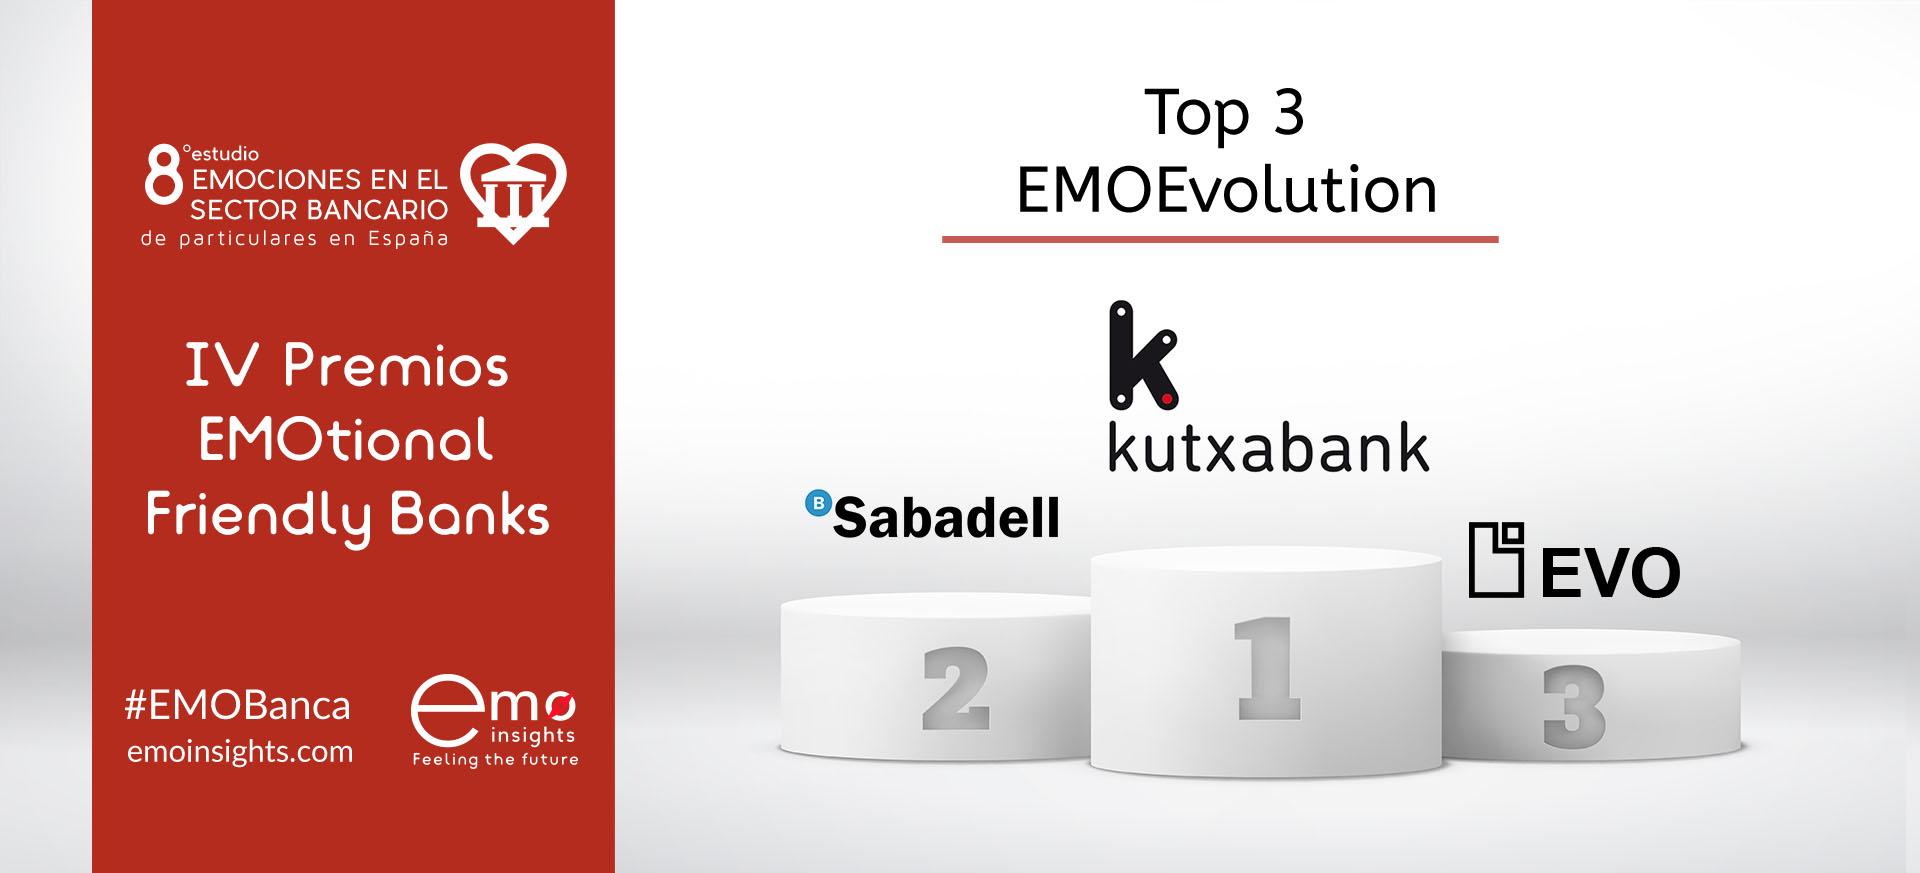 Premios EMOBanca Top 3 EMOindex